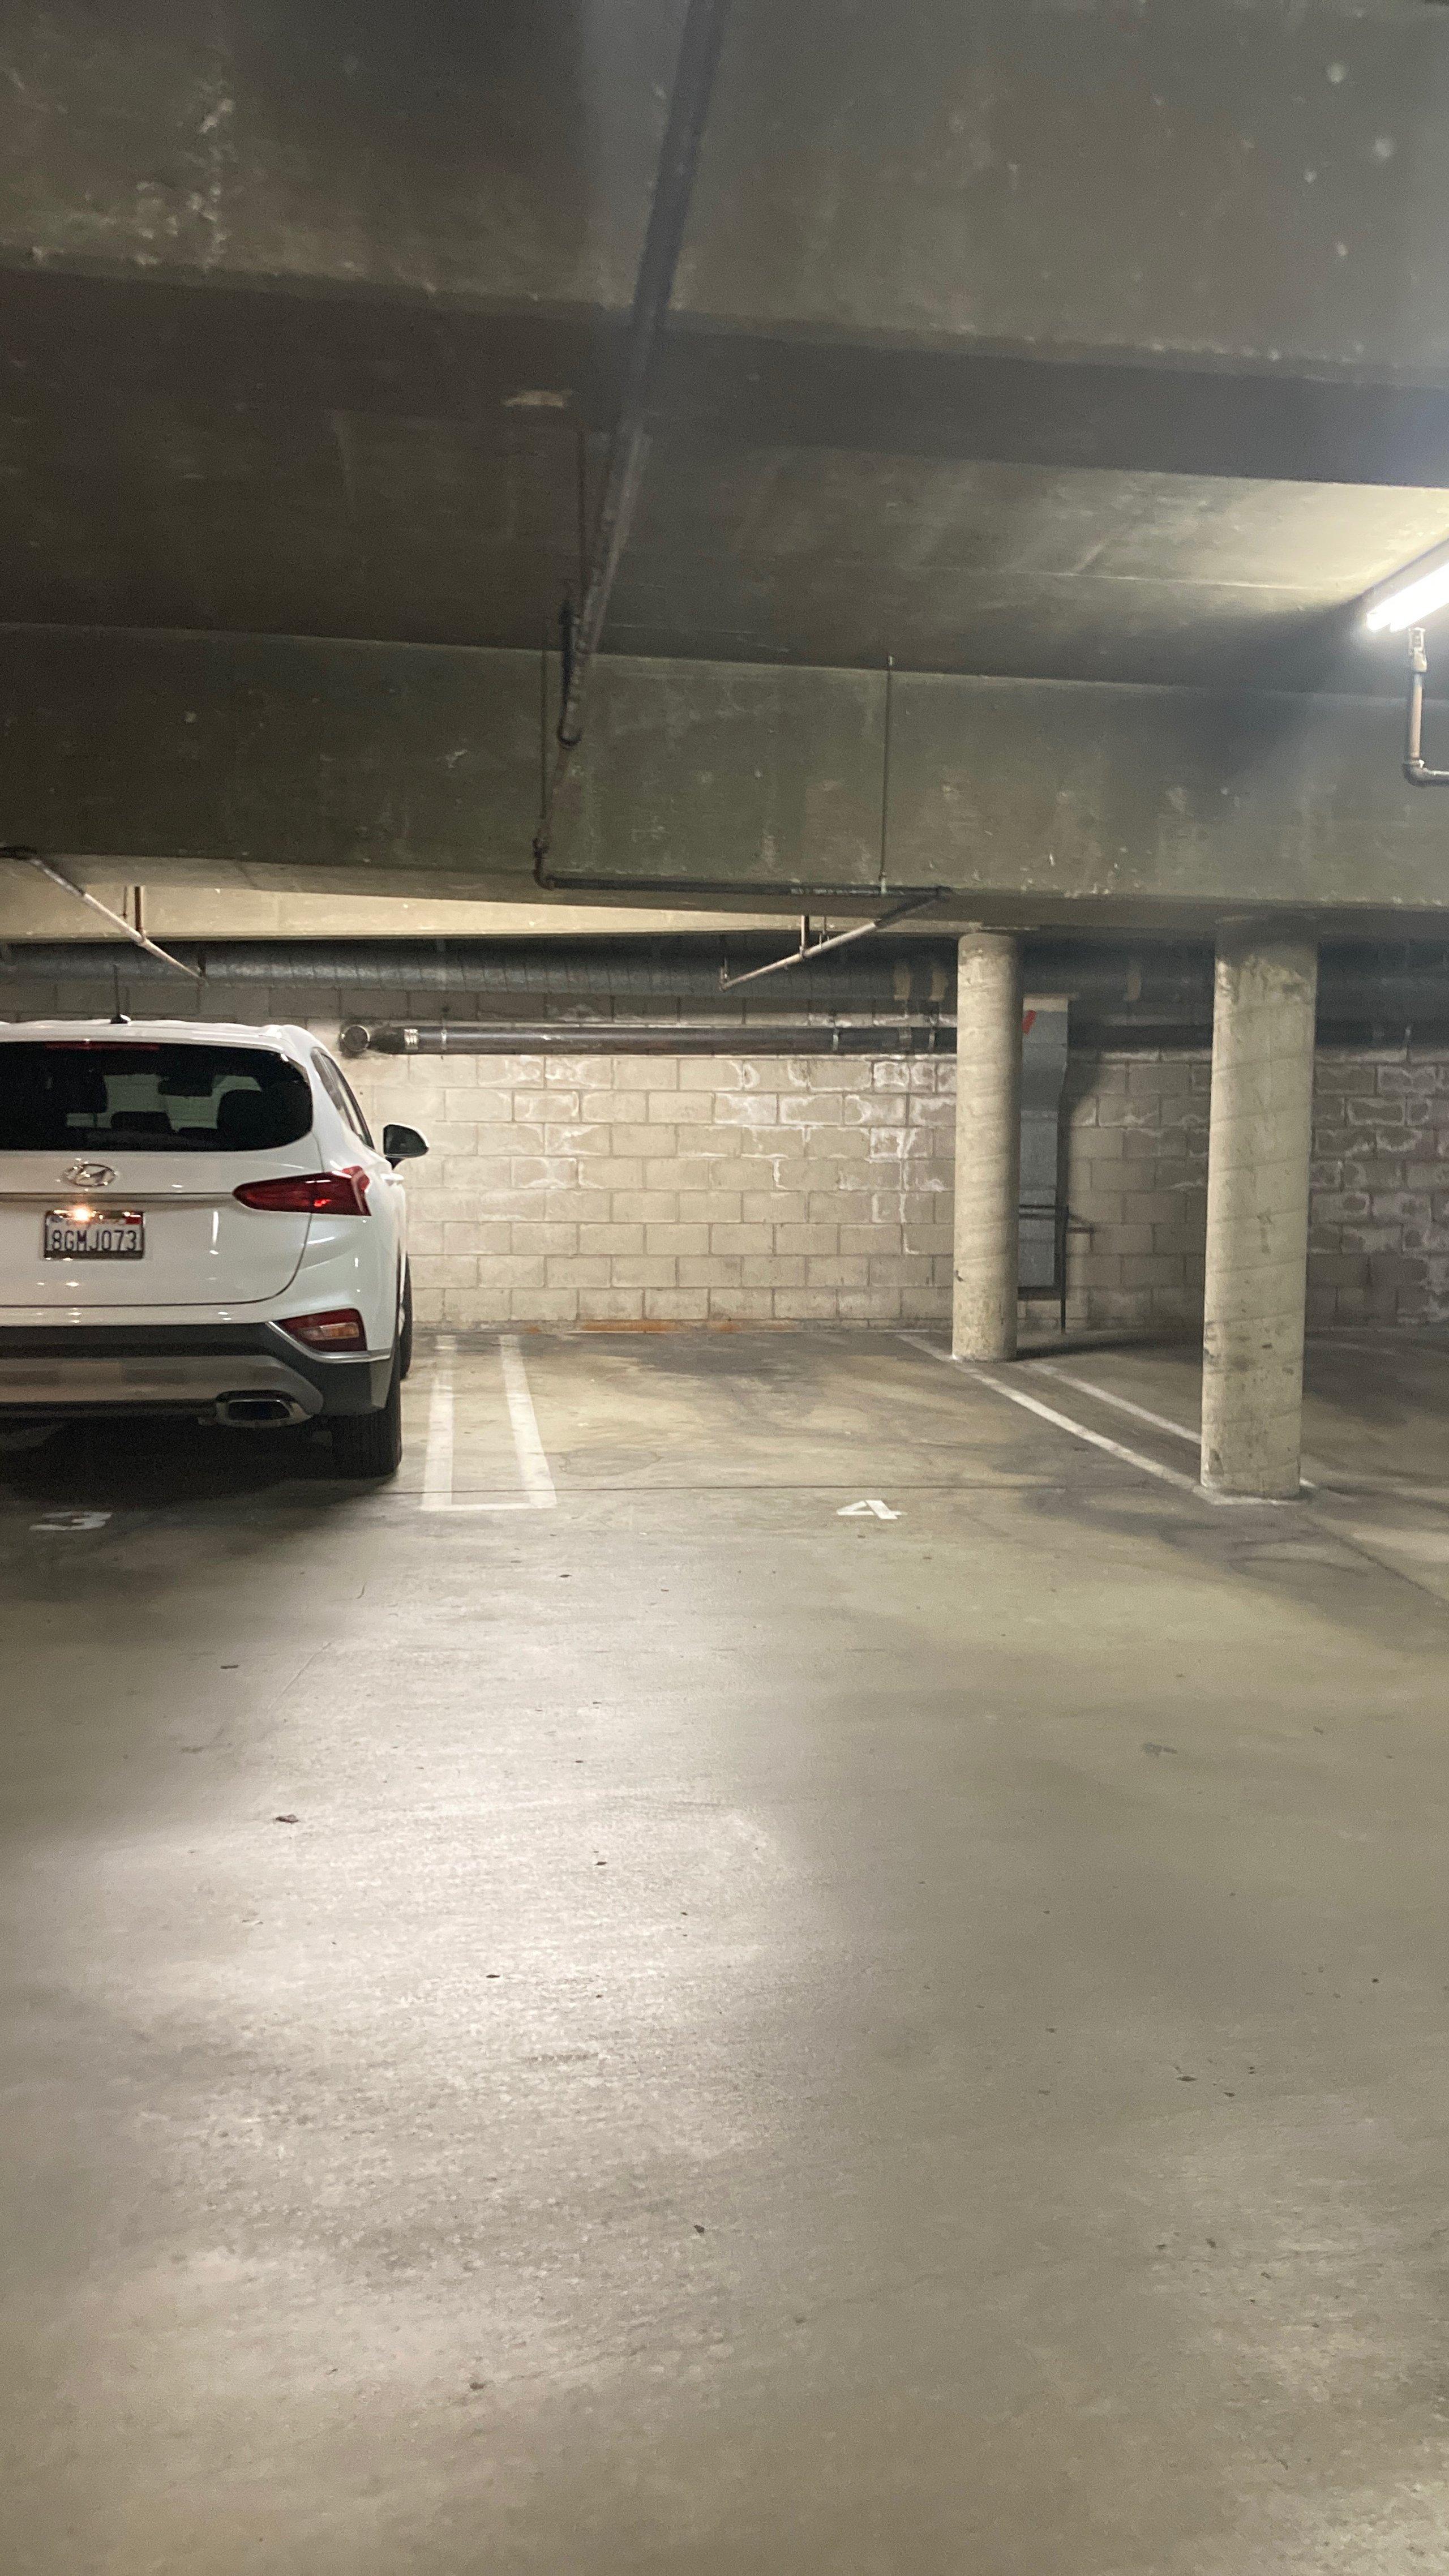 18x8 Parking Lot self storage unit